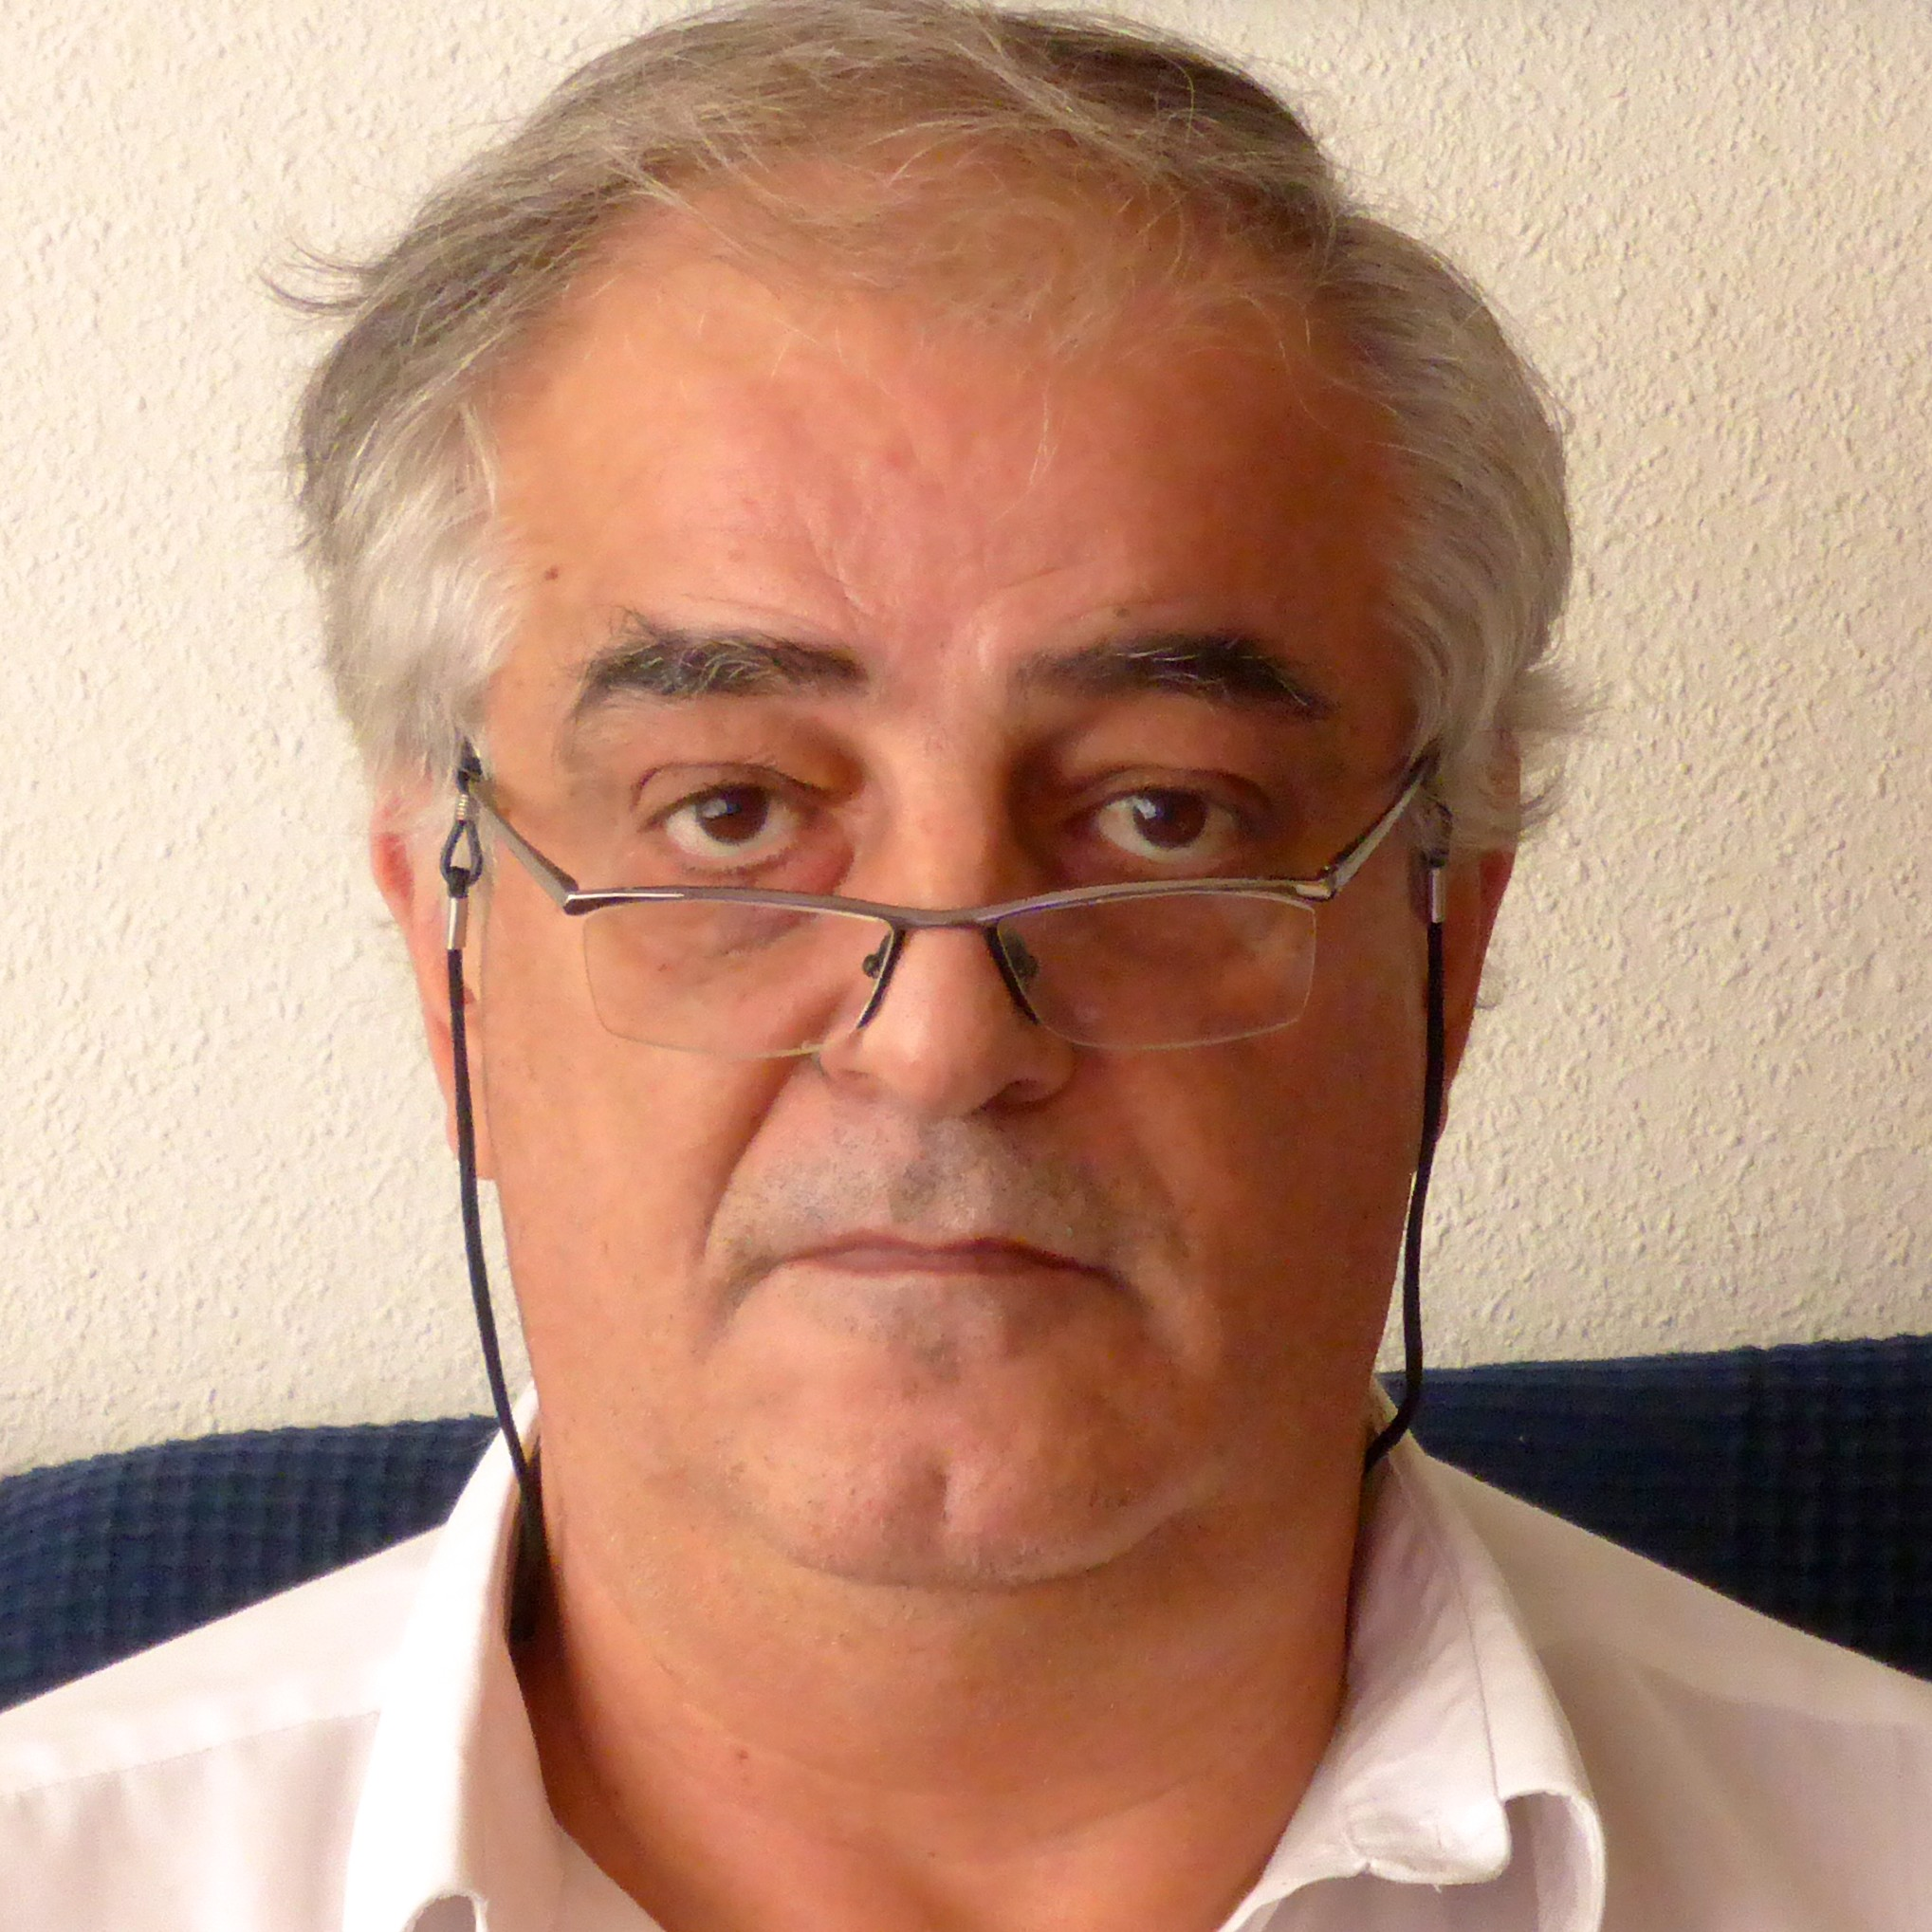 Sanz Carnero Basilio